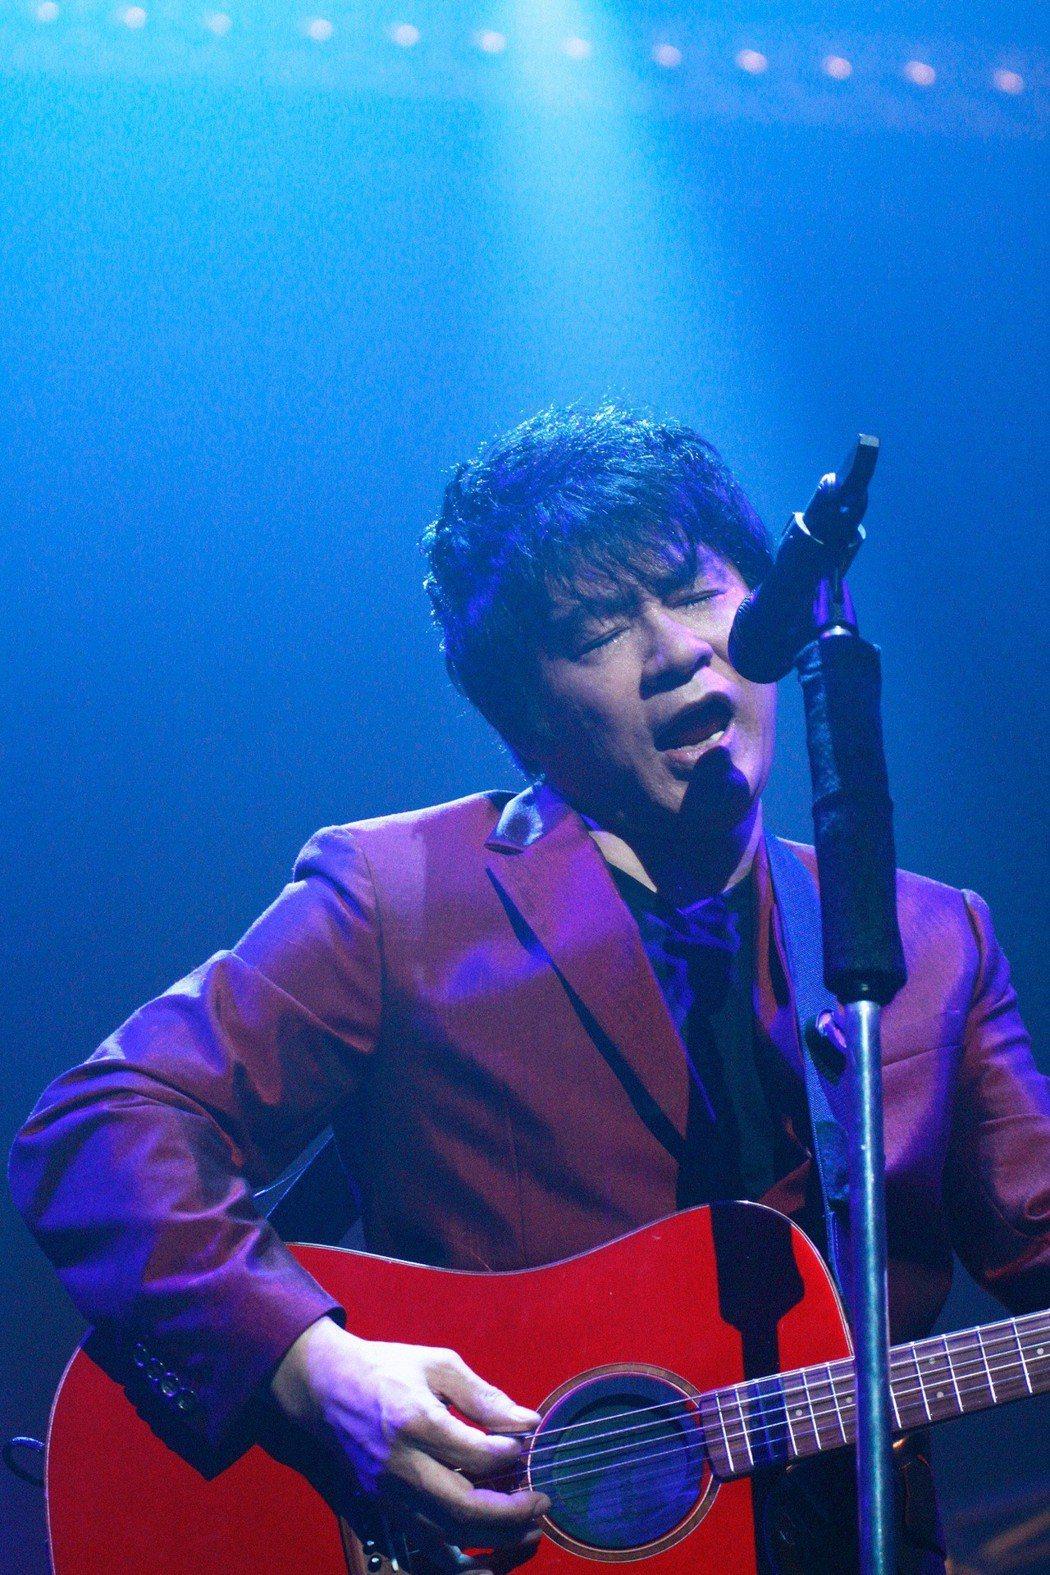 ASKA將於6月9日在台大體育館開唱。圖/Welcome Music 提供